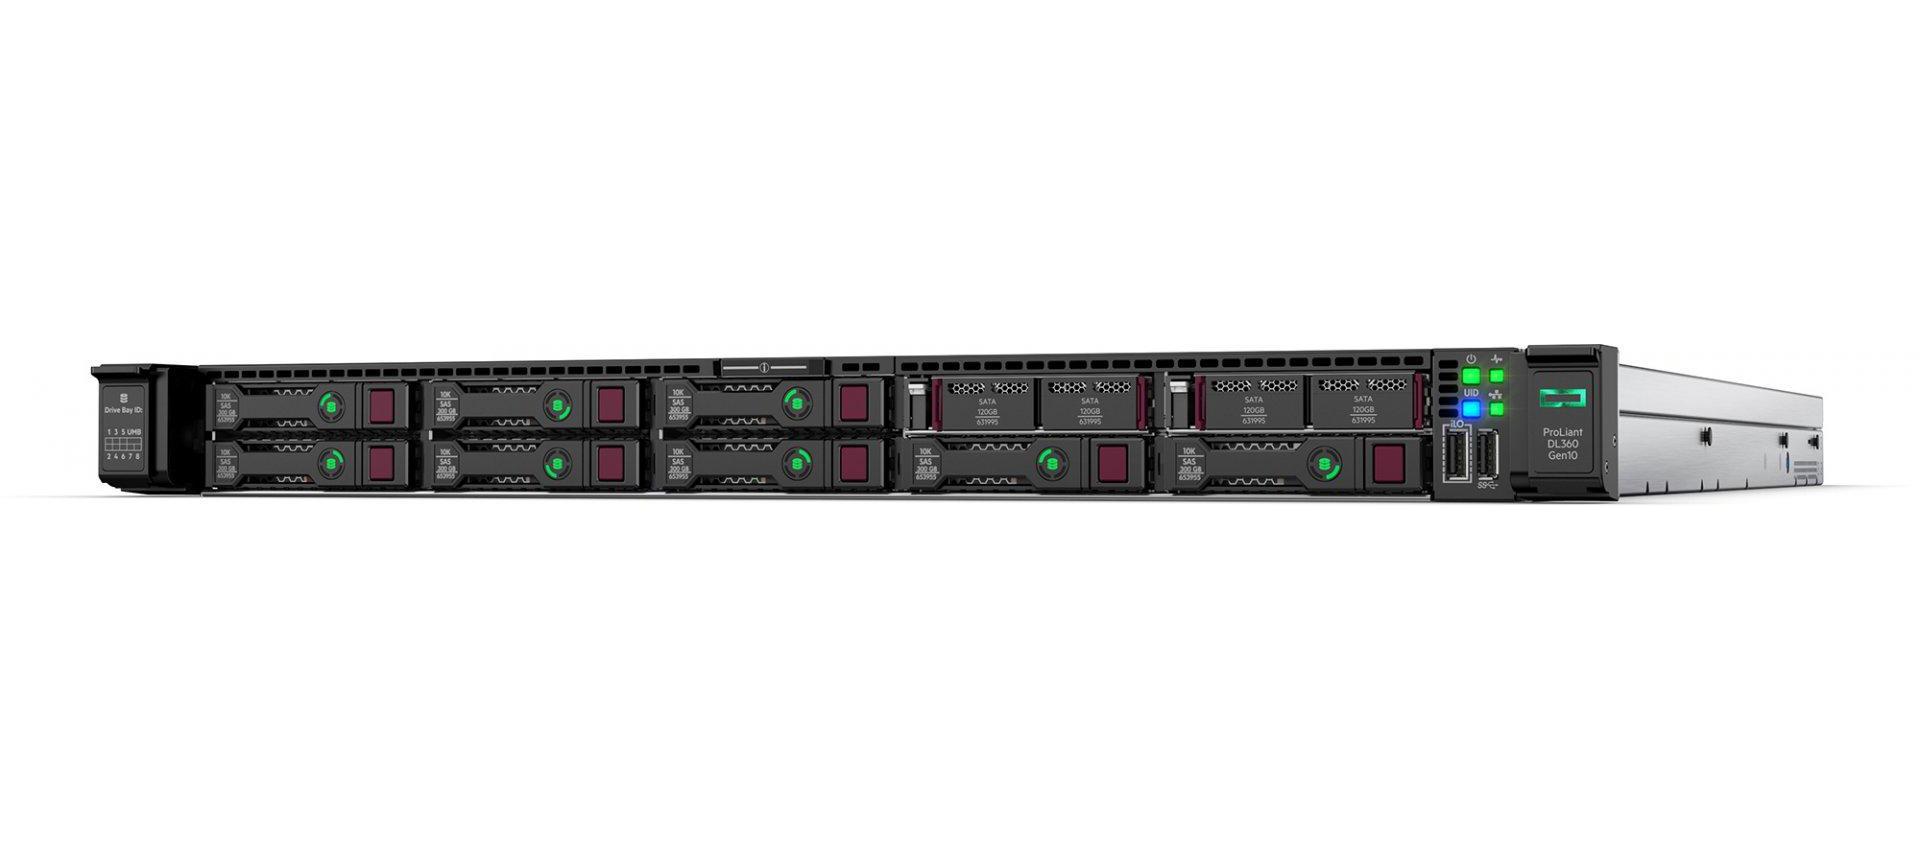 "HP Enterprise ProLiant DL360 Gen10 Network Choice - Server - Rack-Montage - 1U - zweiweg - 1 x Xeon Gold 6248R / 3 GHz - RAM 32 GB - SAS - Hot-Swap 6.4 cm (2.5"")"